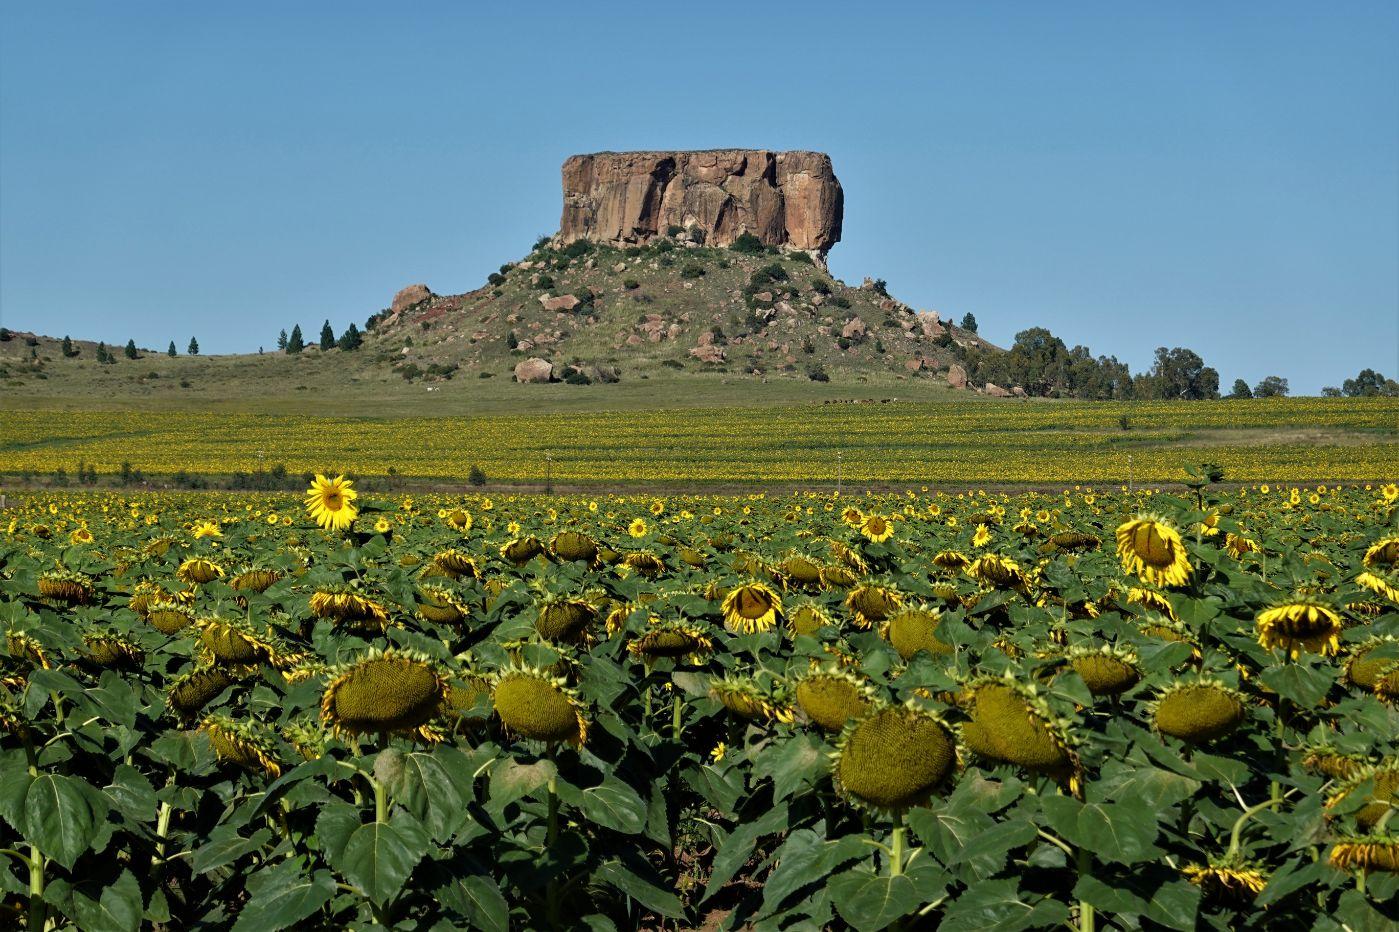 Fascinující krajina okolo Bloemfonteinu